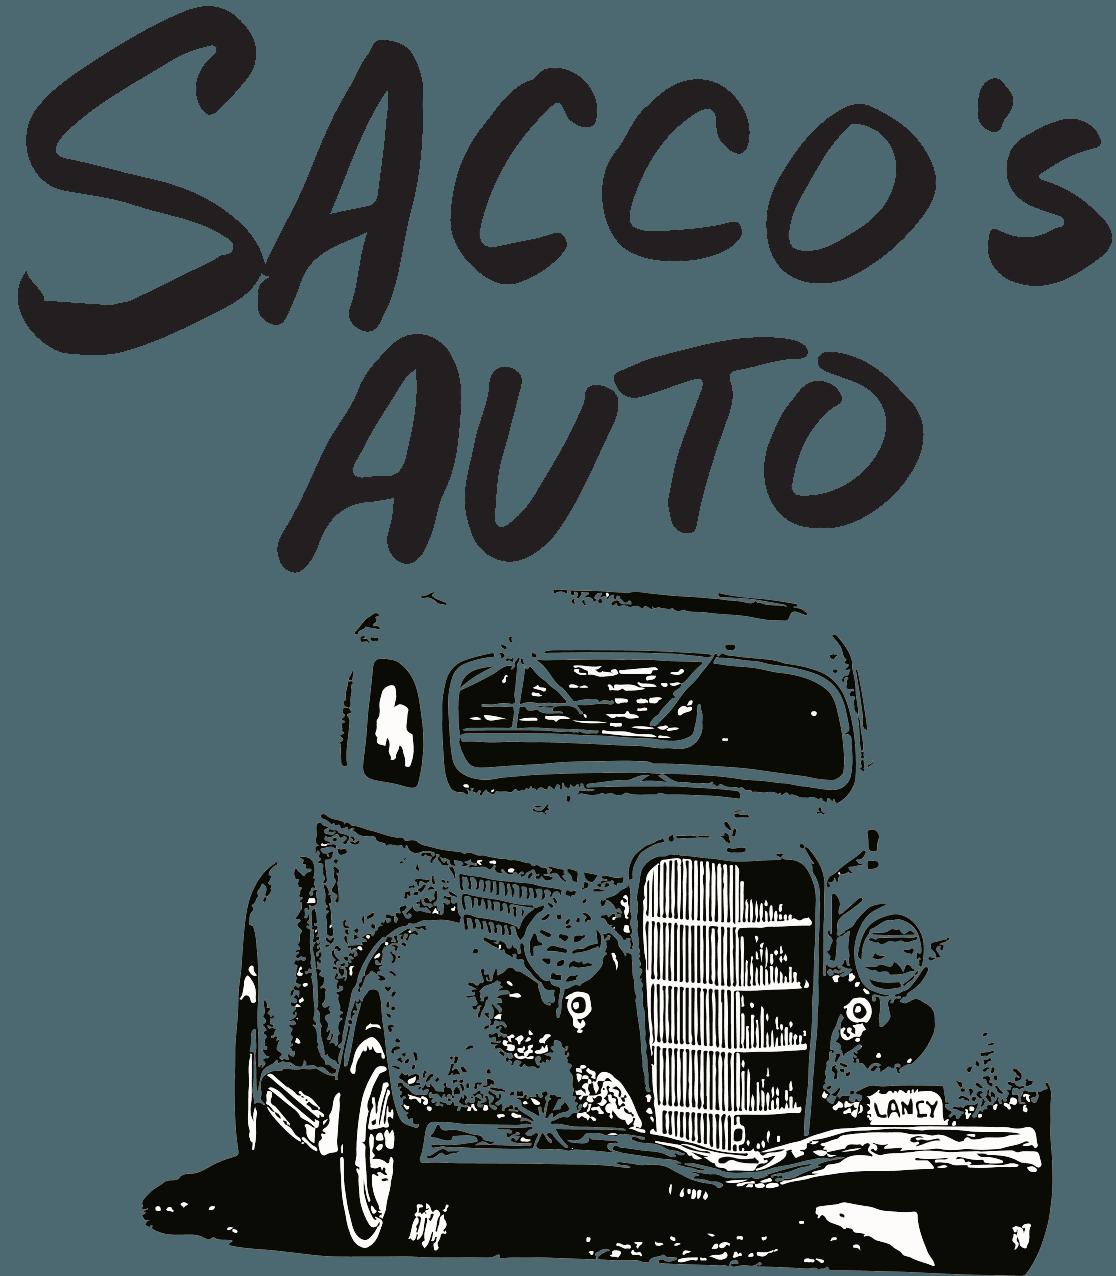 Sacco's Auto Repair Logo